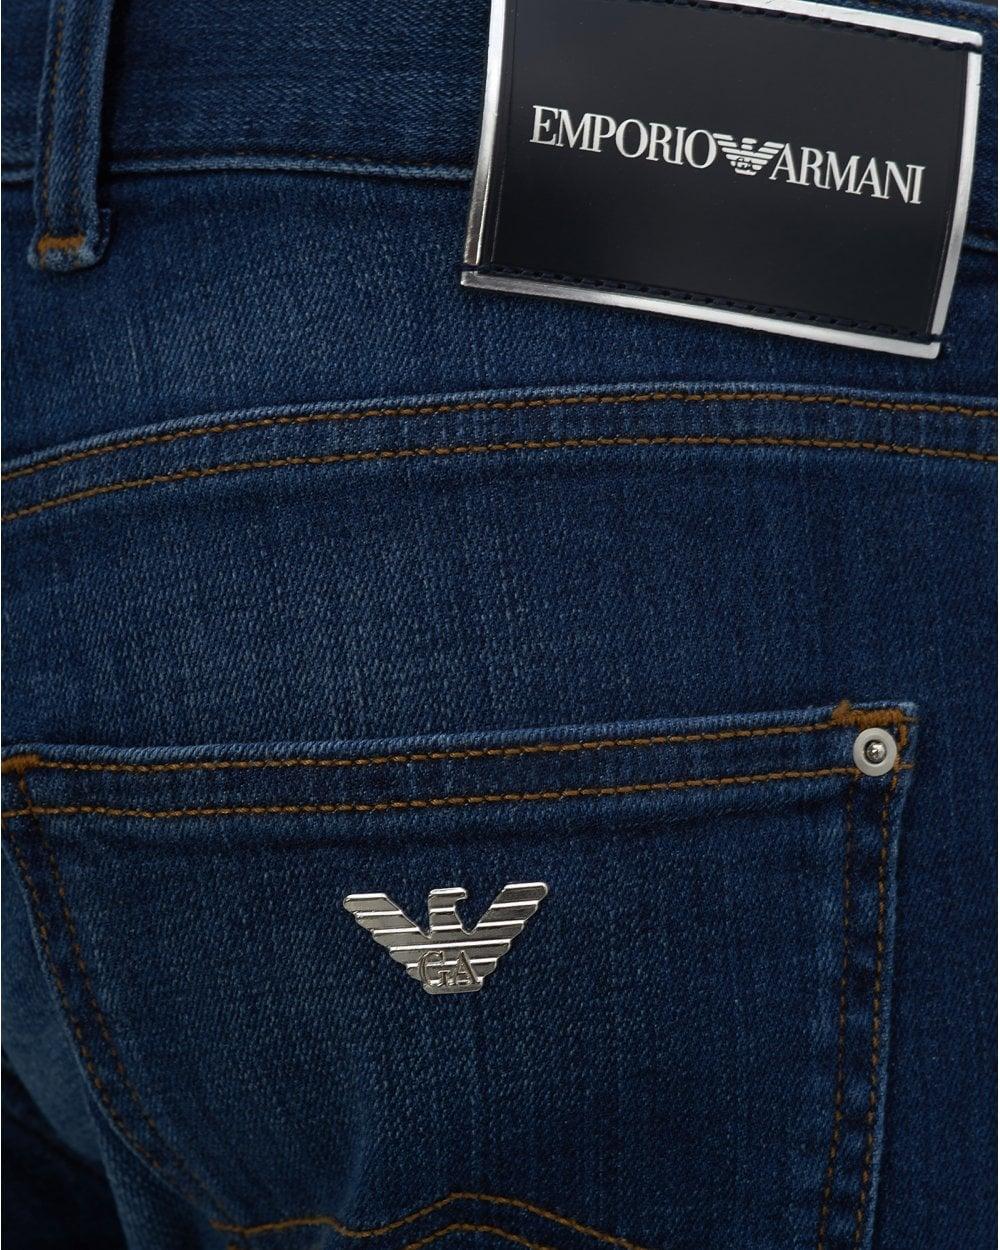 armani jeans brand